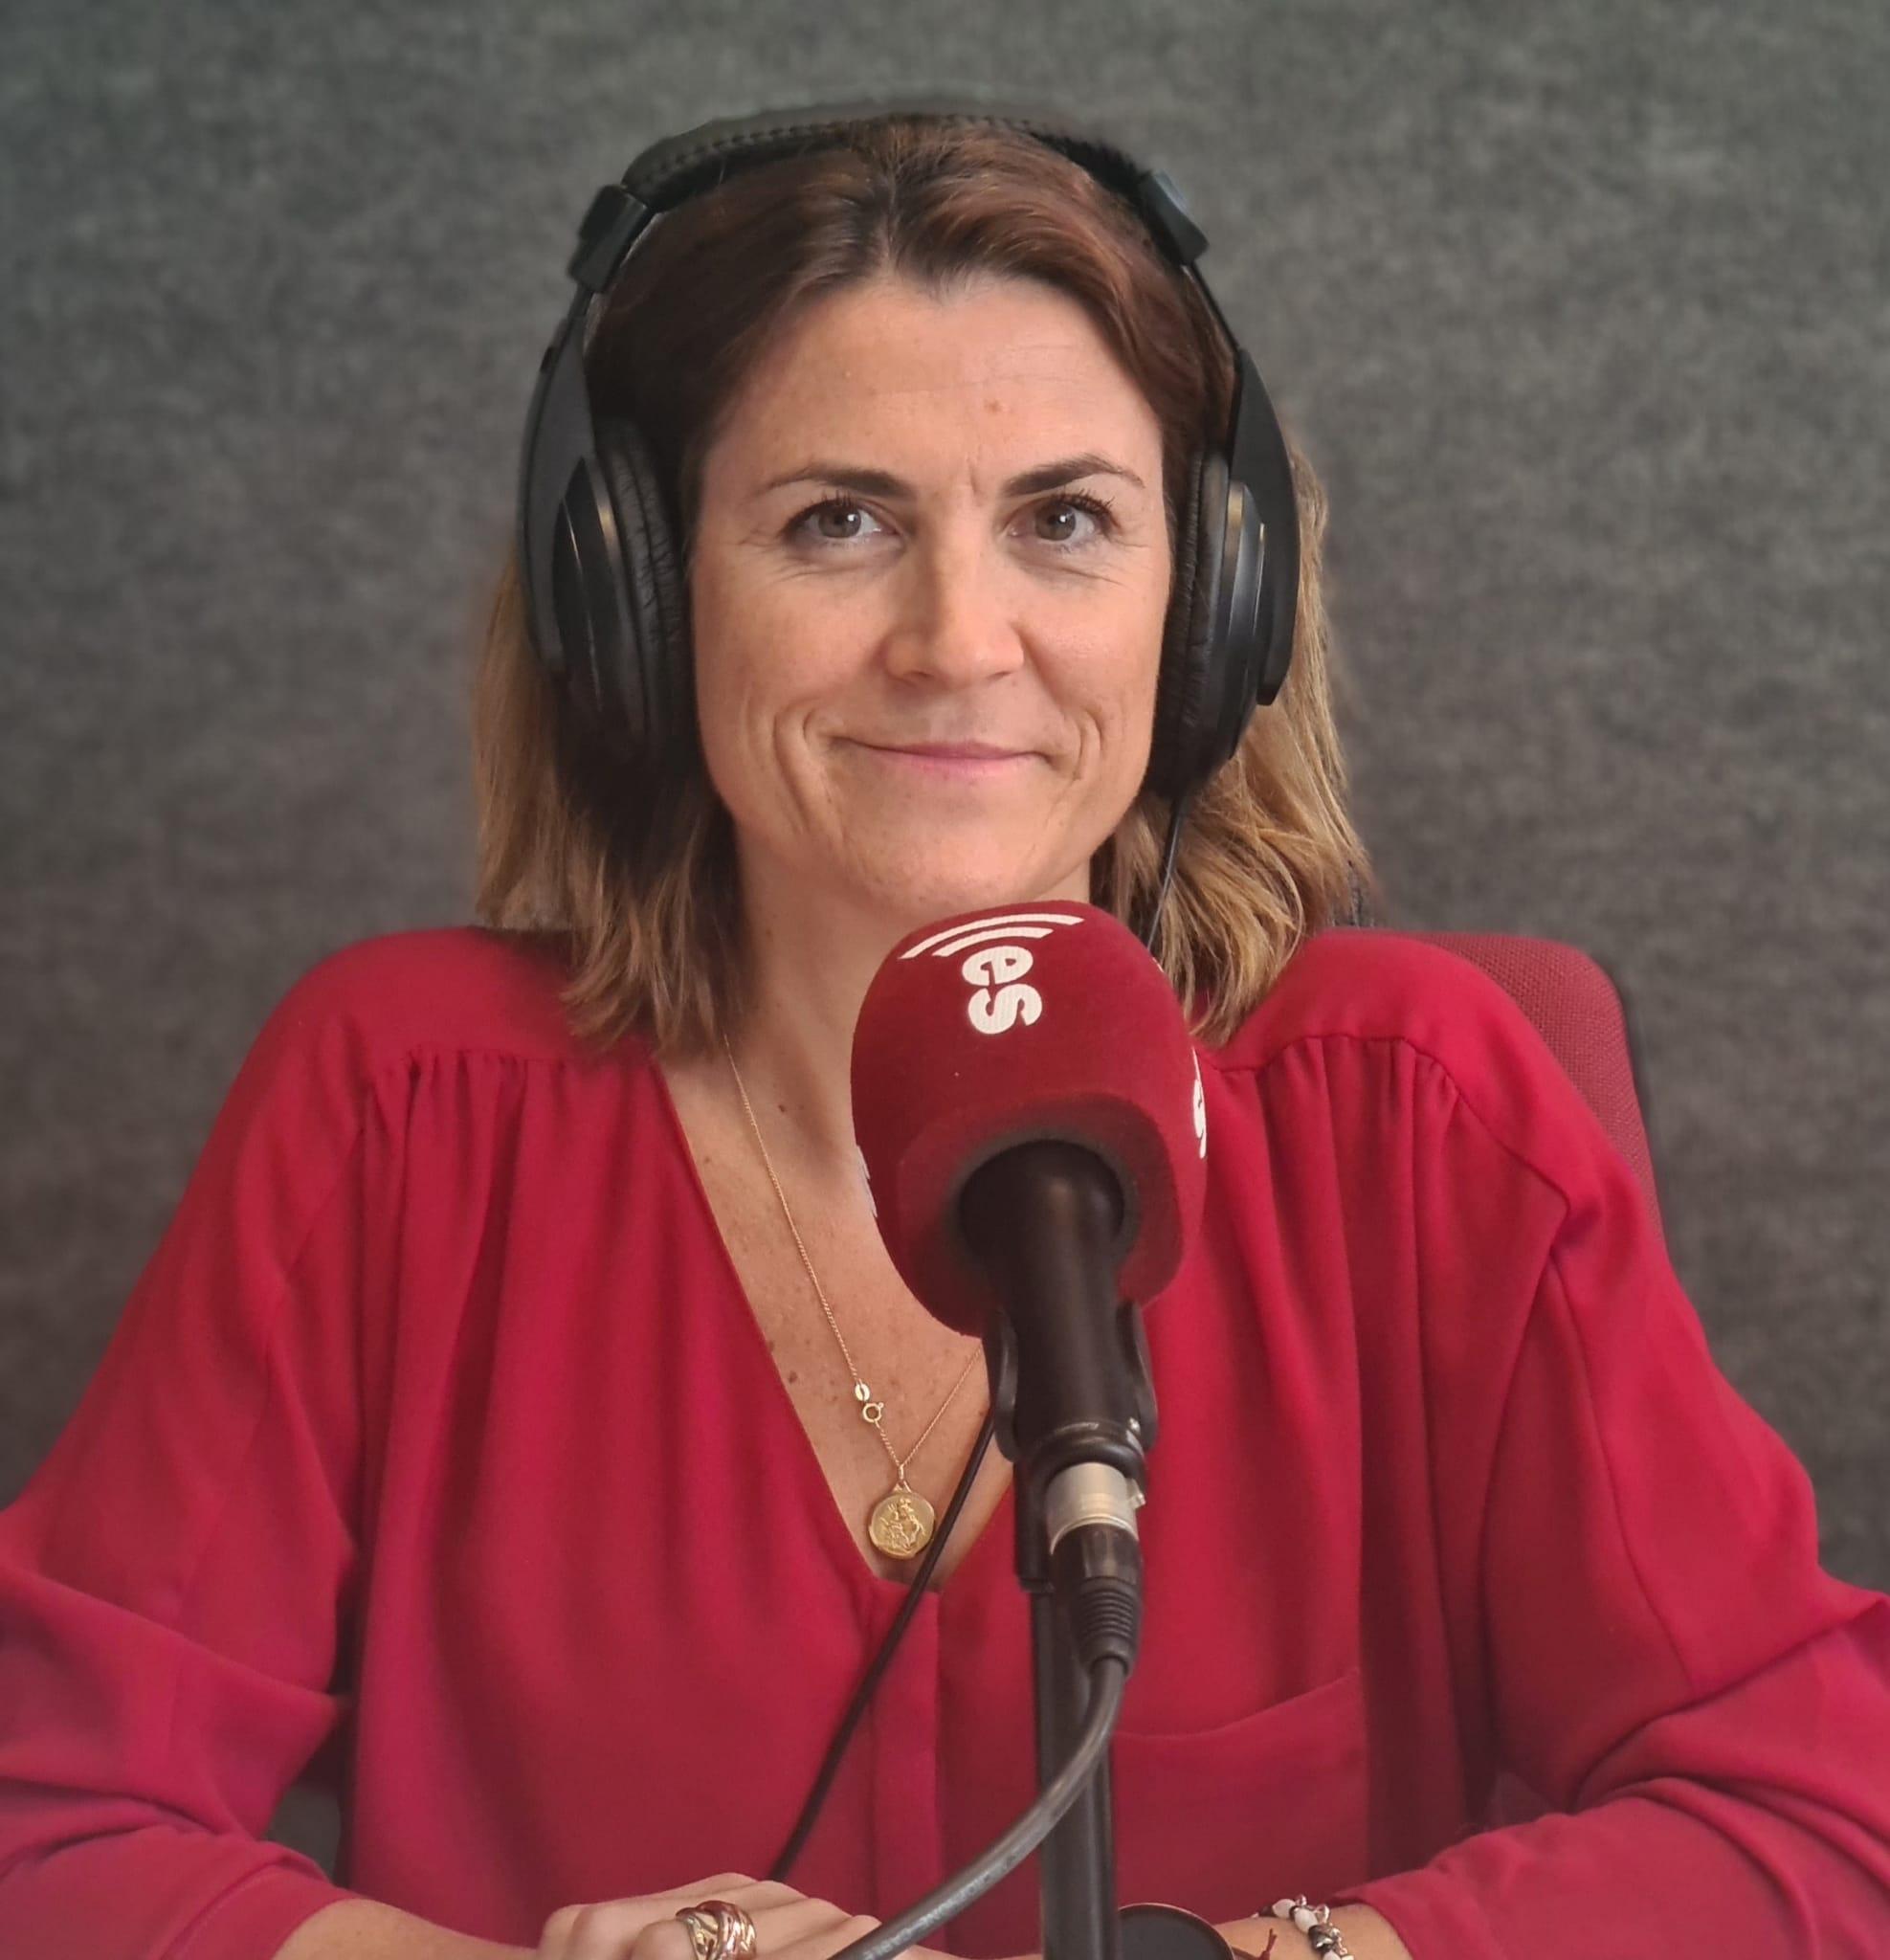 Paloma Carrasco